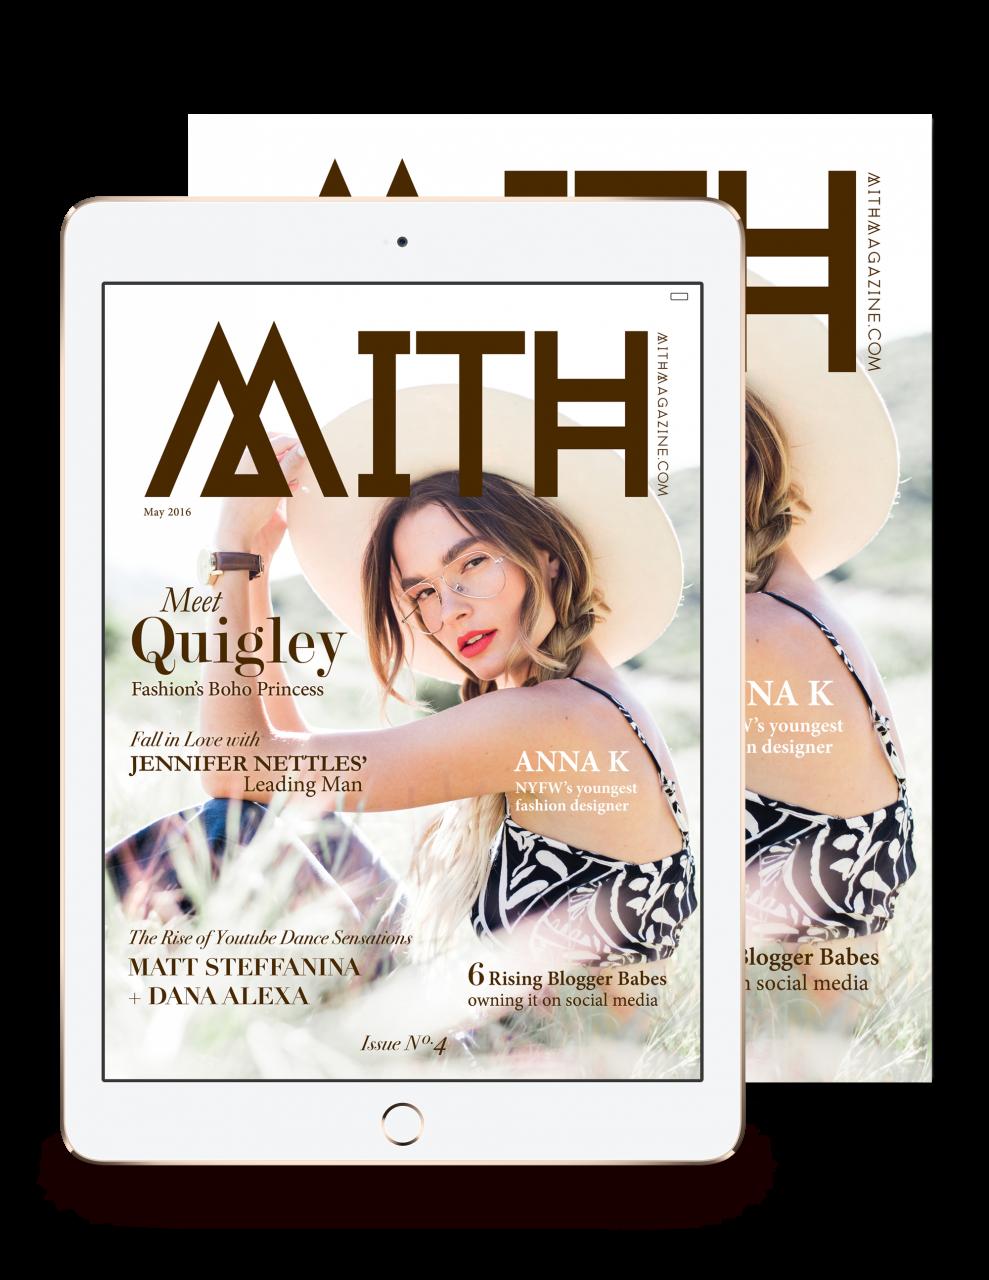 MITH Issue No.4 - Quigley, Matt Steffanina, Dana Alexa, Mariah Strongin, Jennifer Nettles